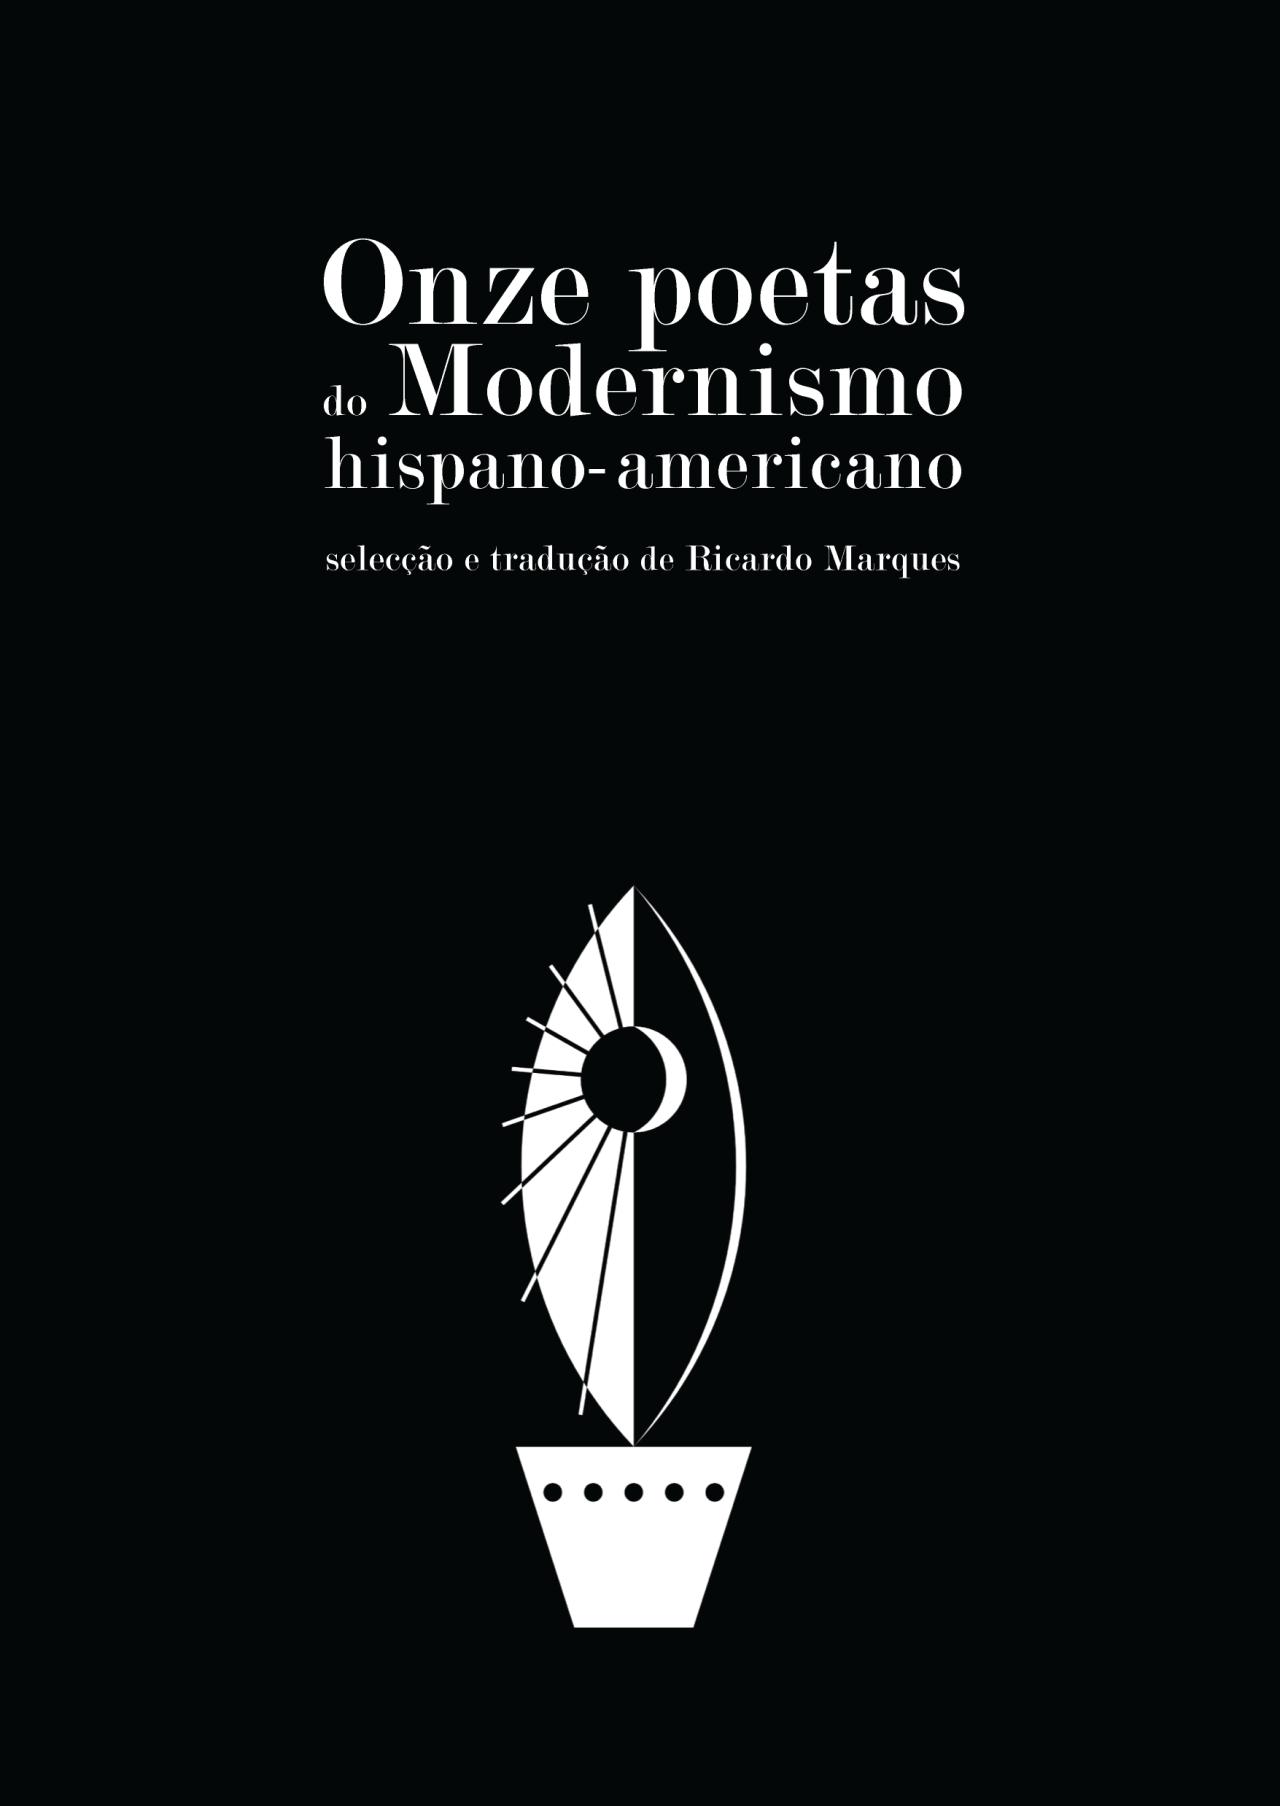 Onze poetas do Modernismo hispano-americano